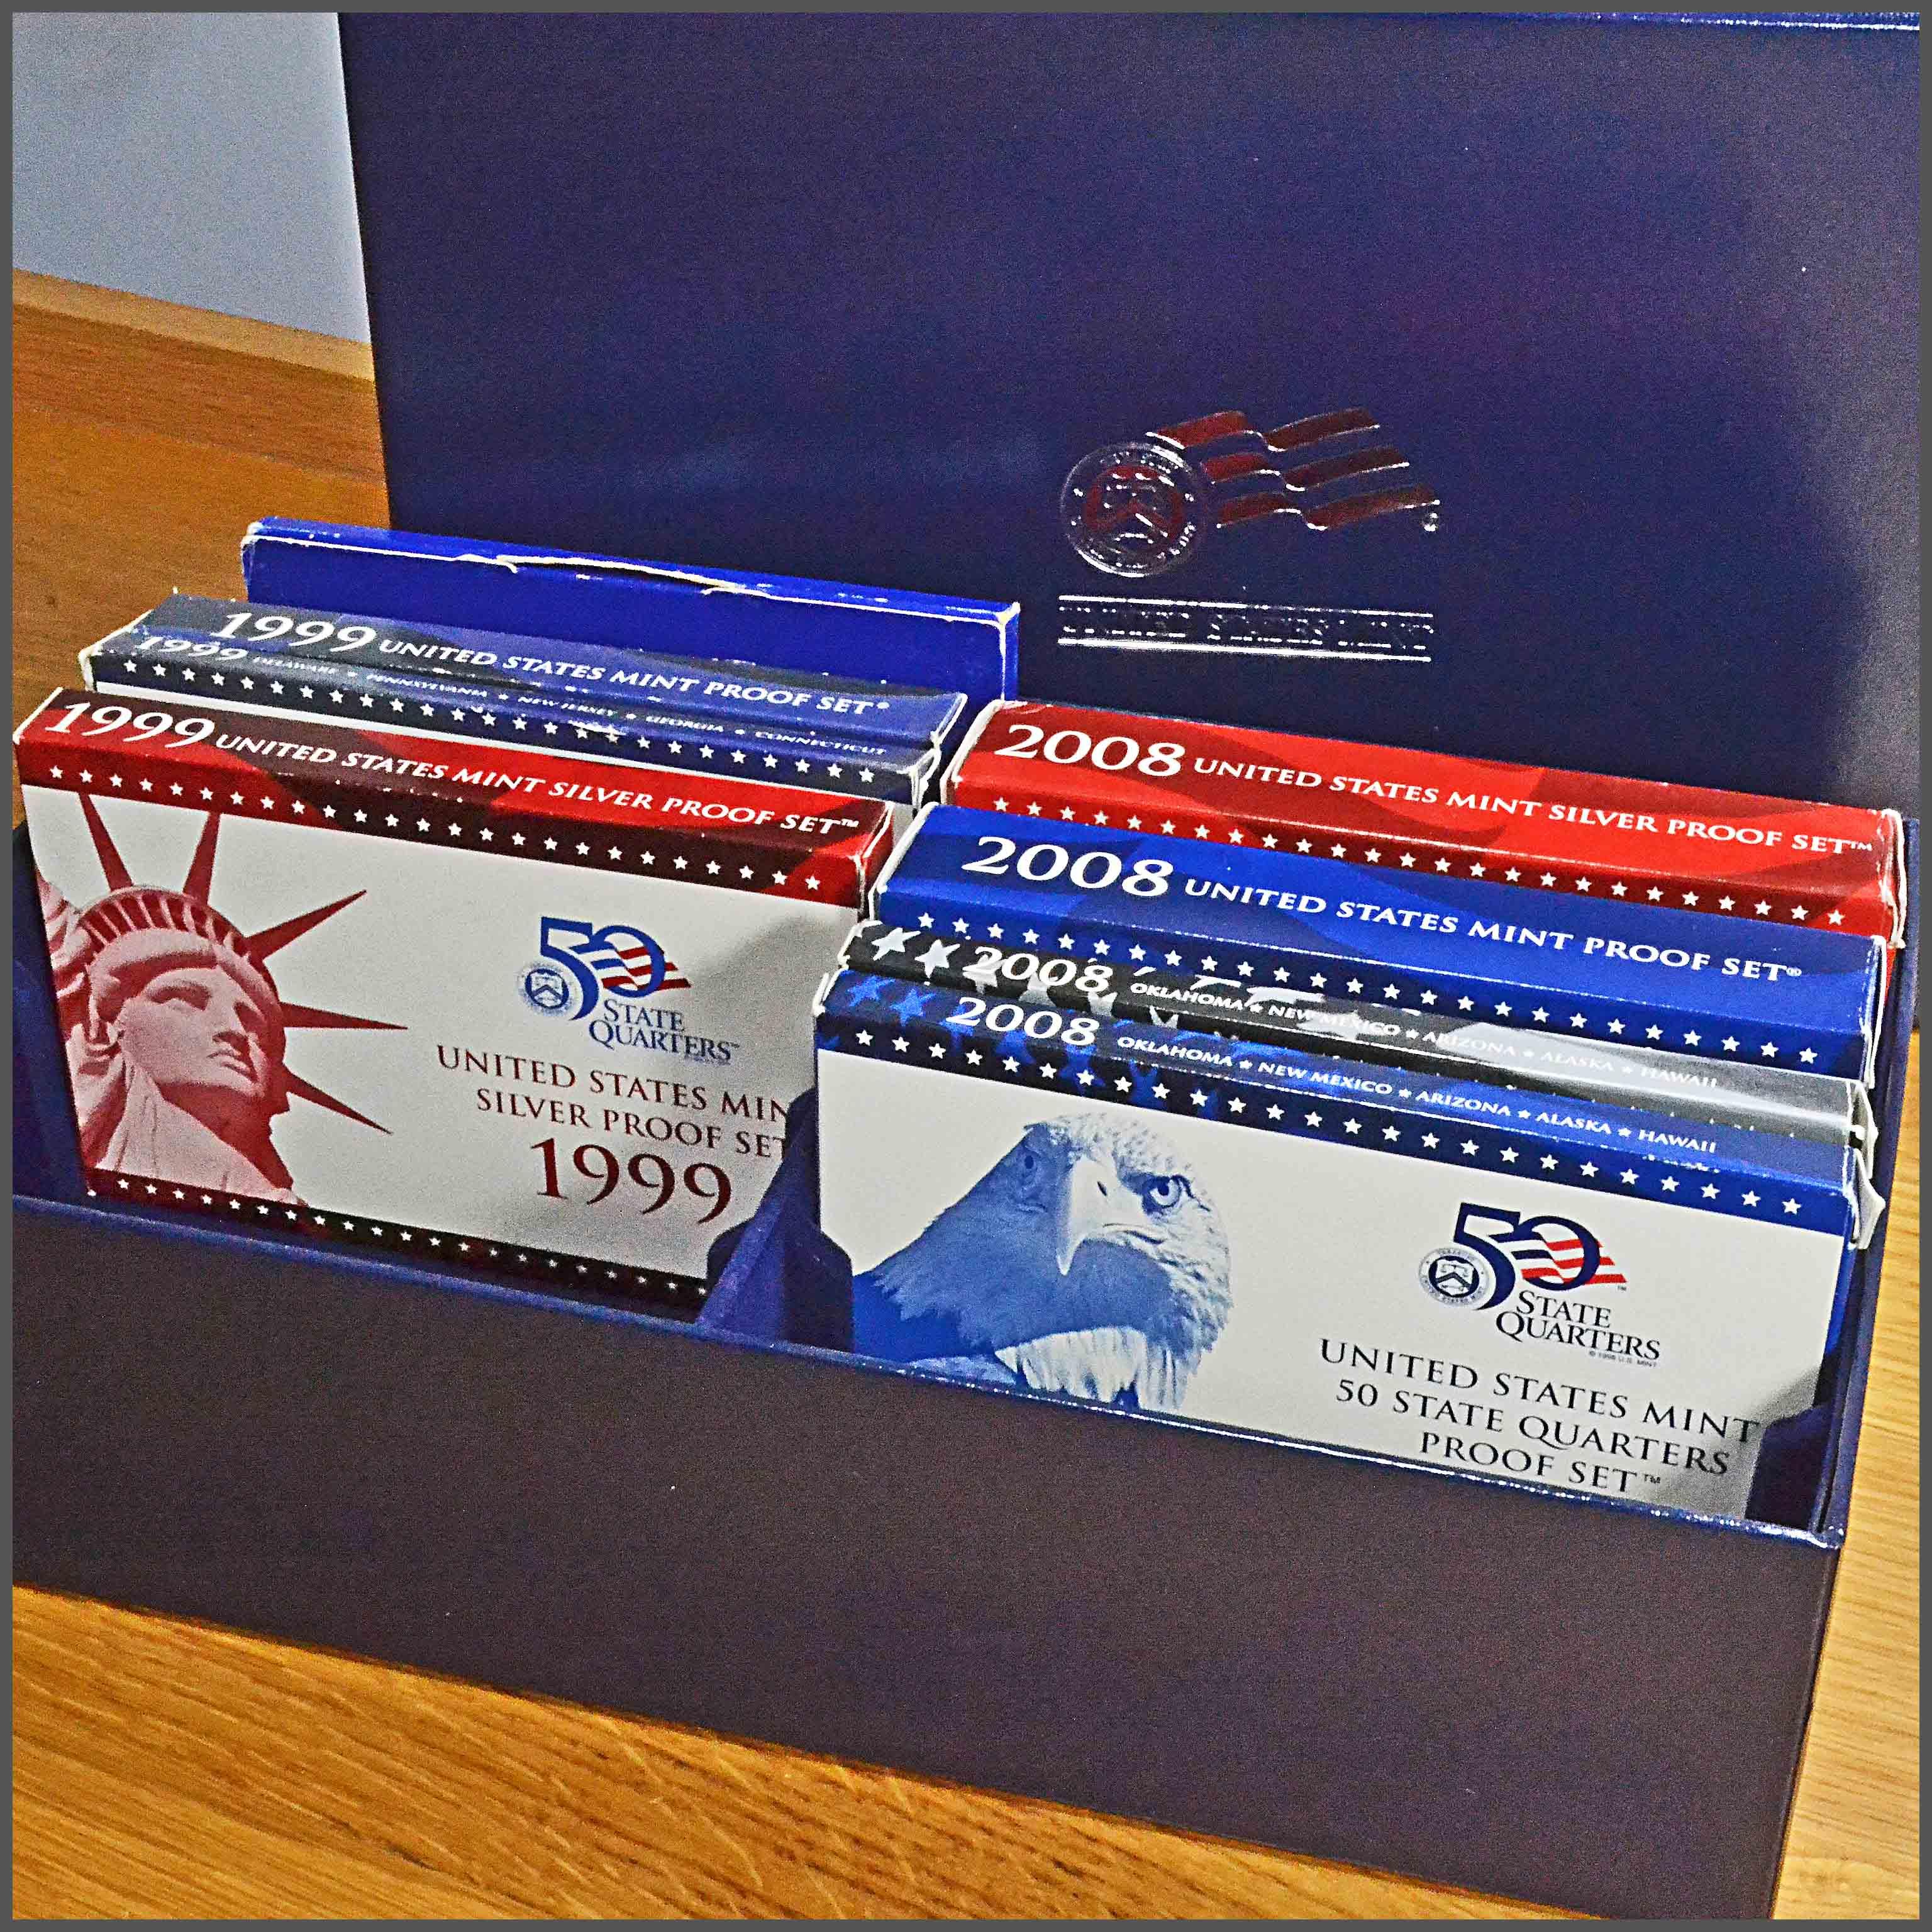 US Mint Proof Sets in Mint Box